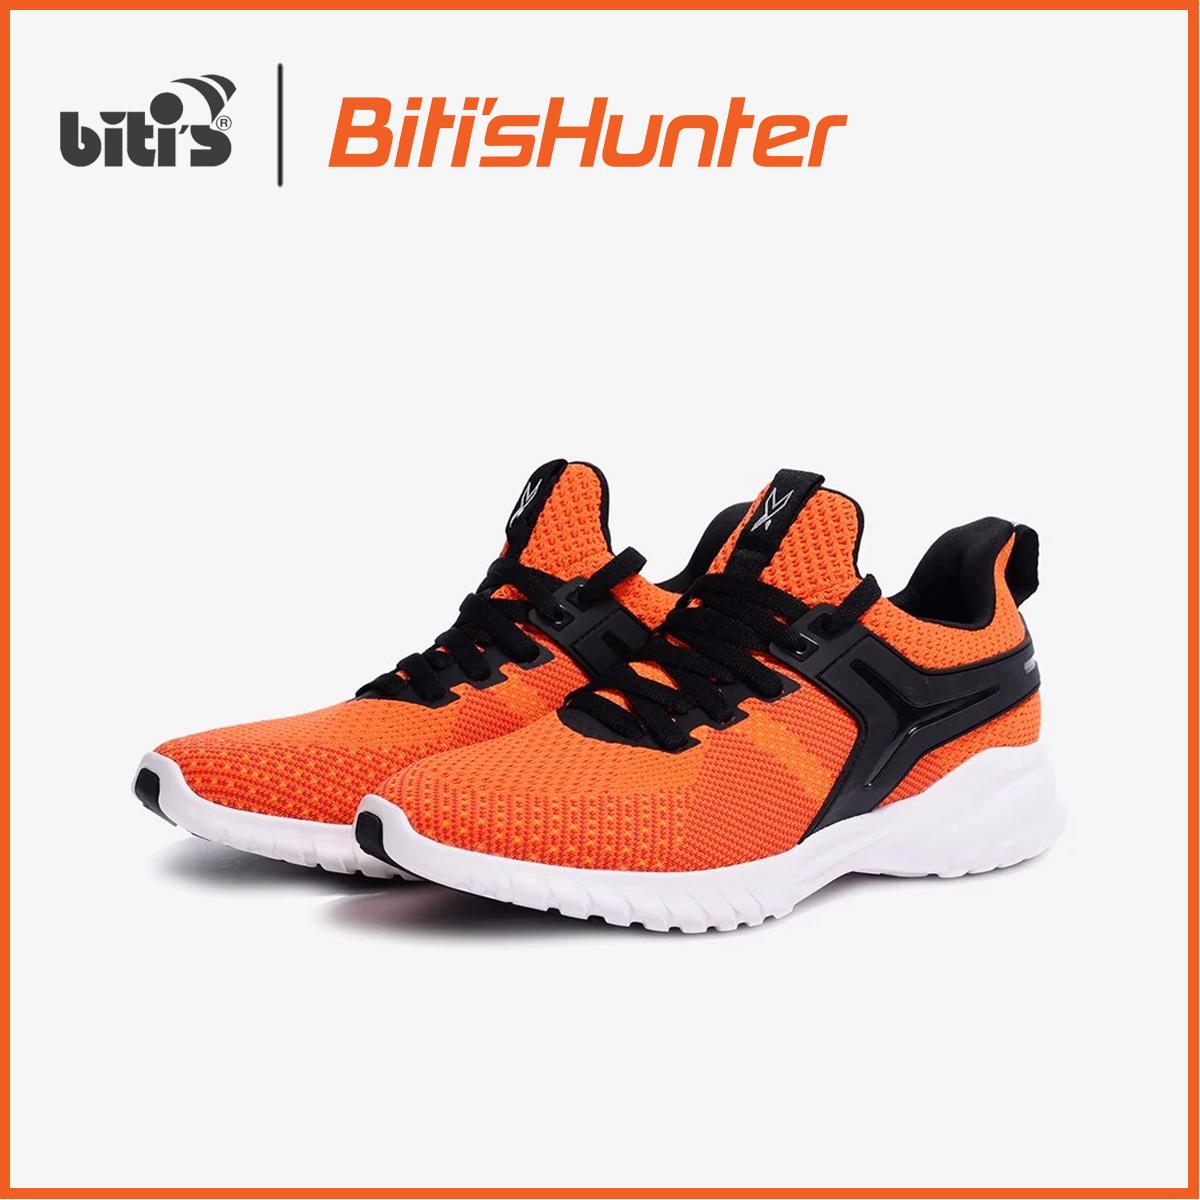 Giày Thể Thao Biti's Hunter X Nam 2K18 SUNRISE ORANGE DSUH00100CAM Cam